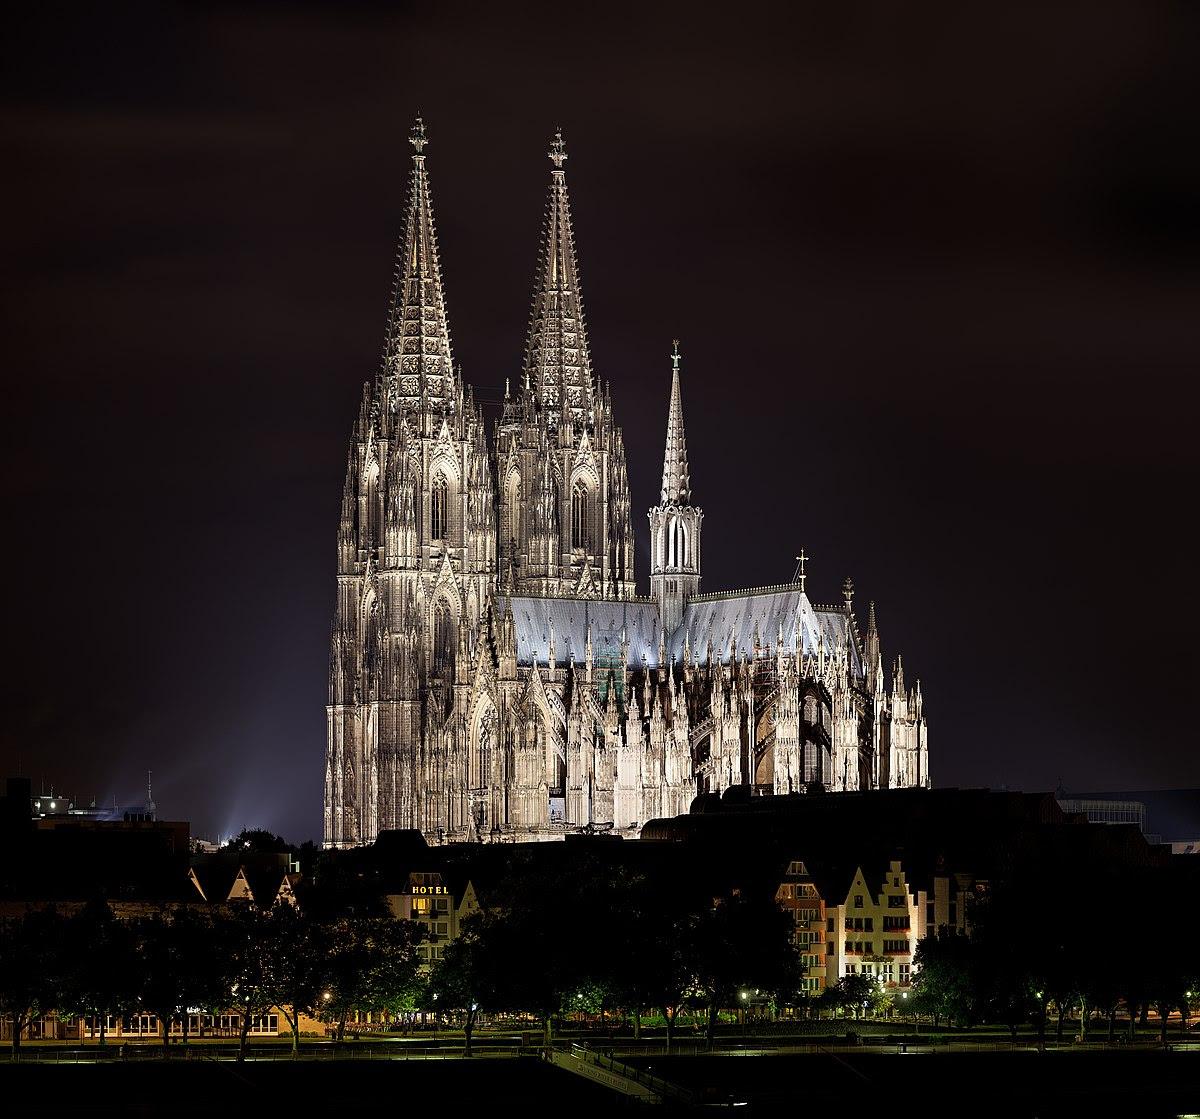 Kölner Dom nachts 2013.jpg